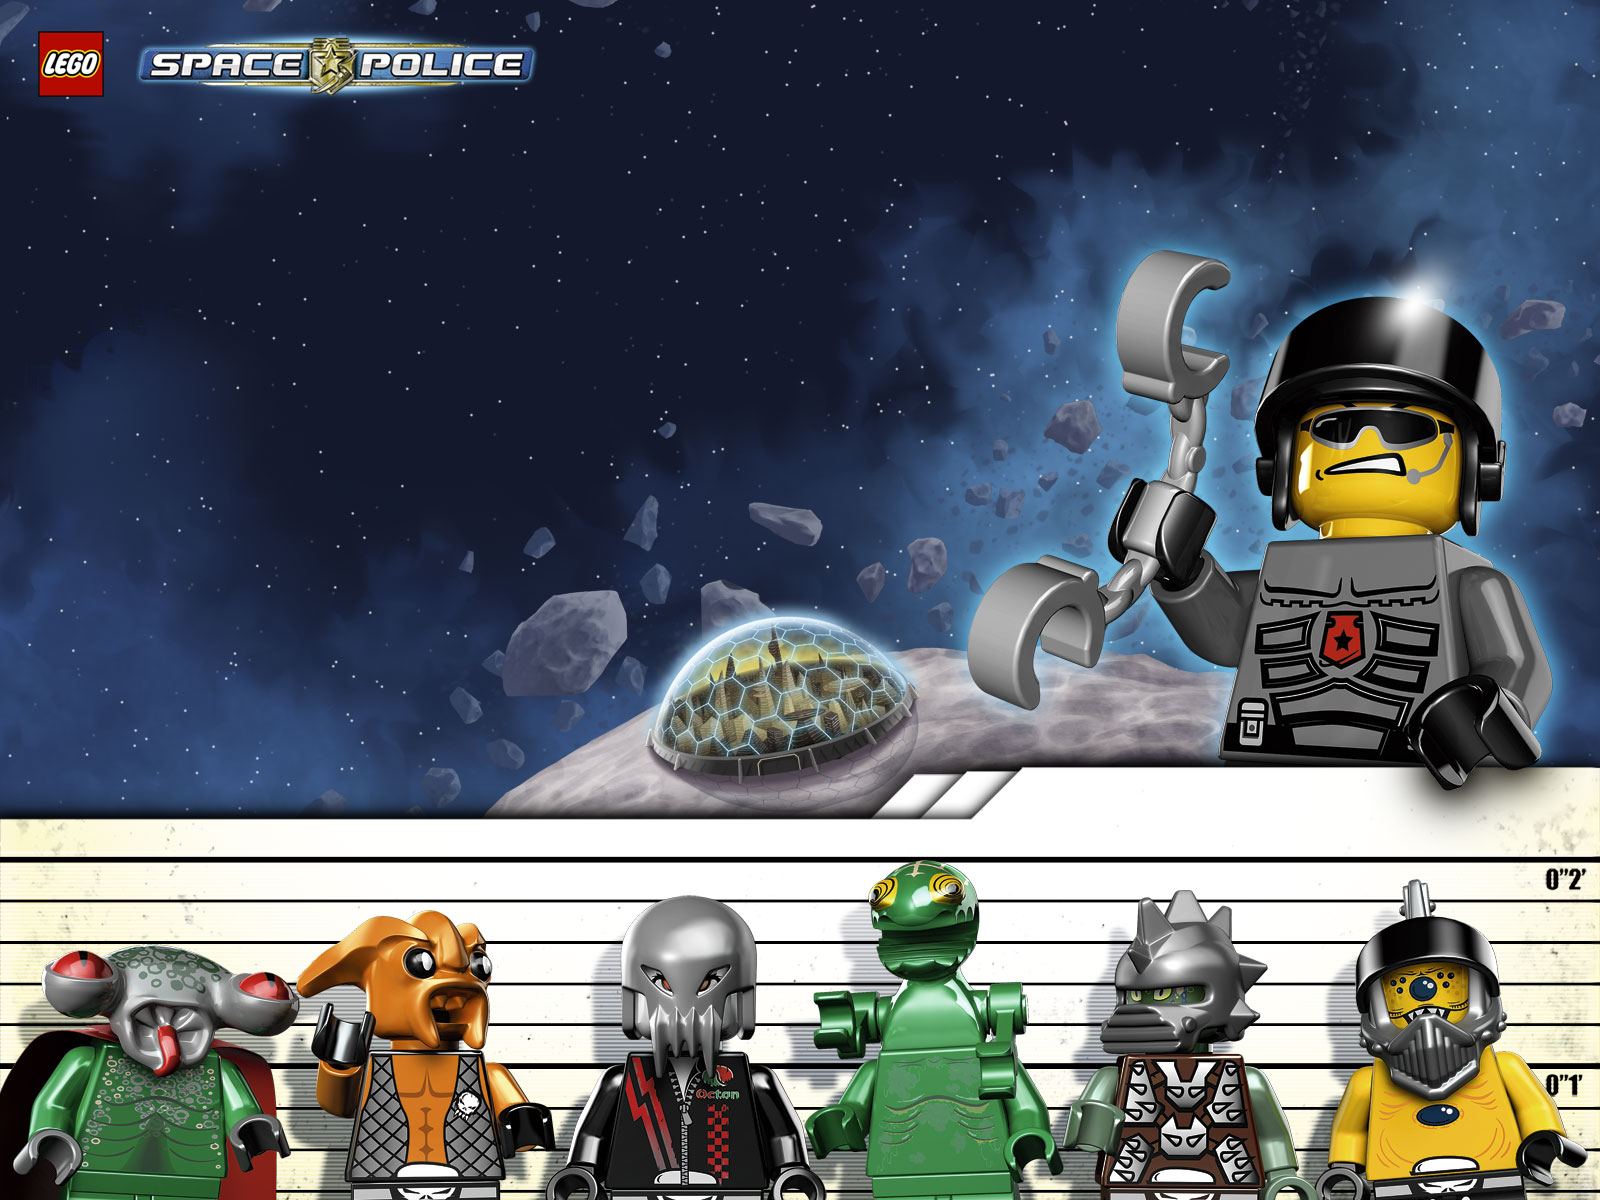 image - space police iii wallpaper2 | brickipedia | fandom